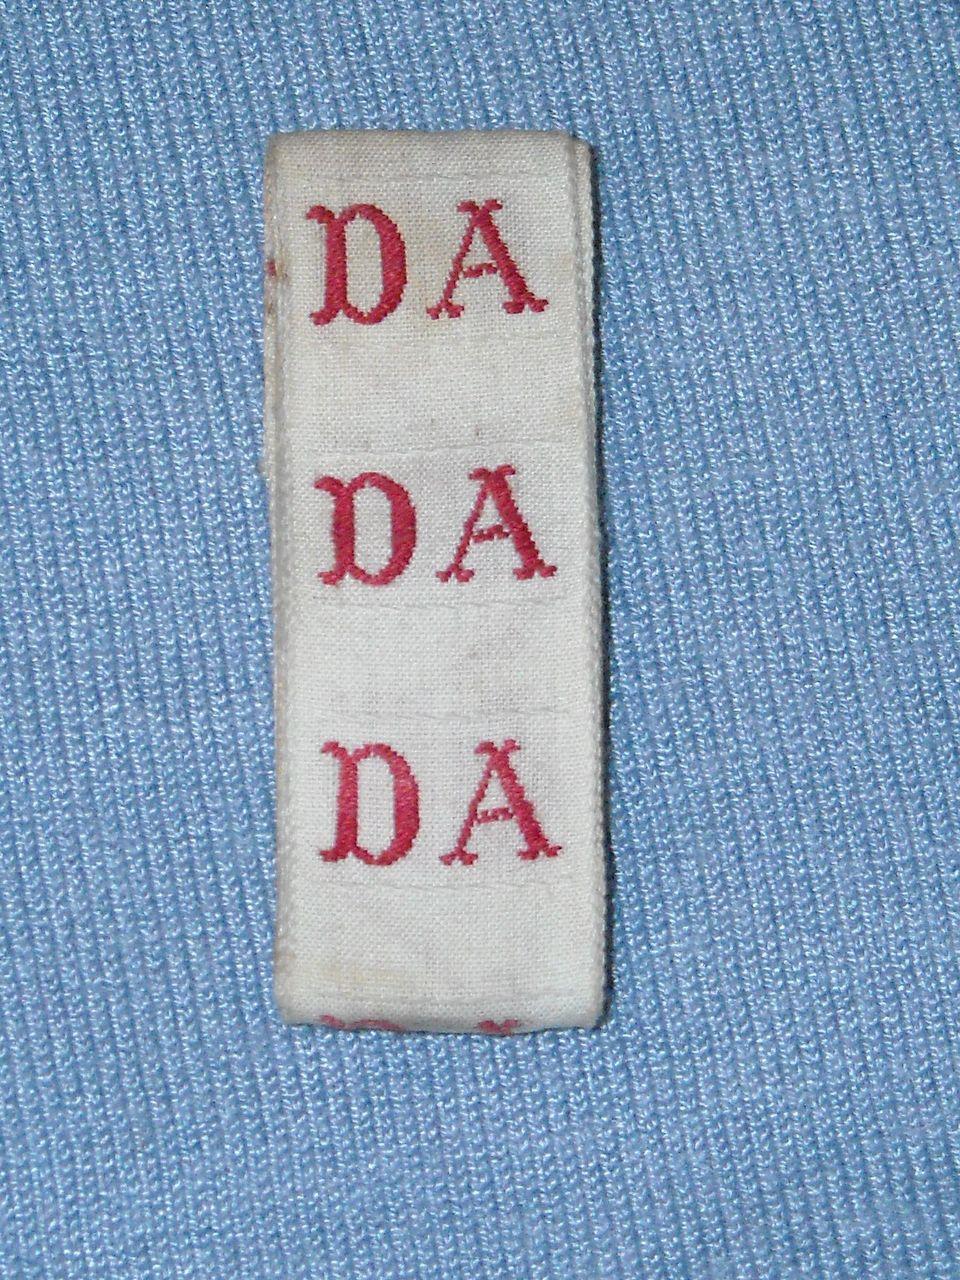 French Laundry Monogram Tape – DA